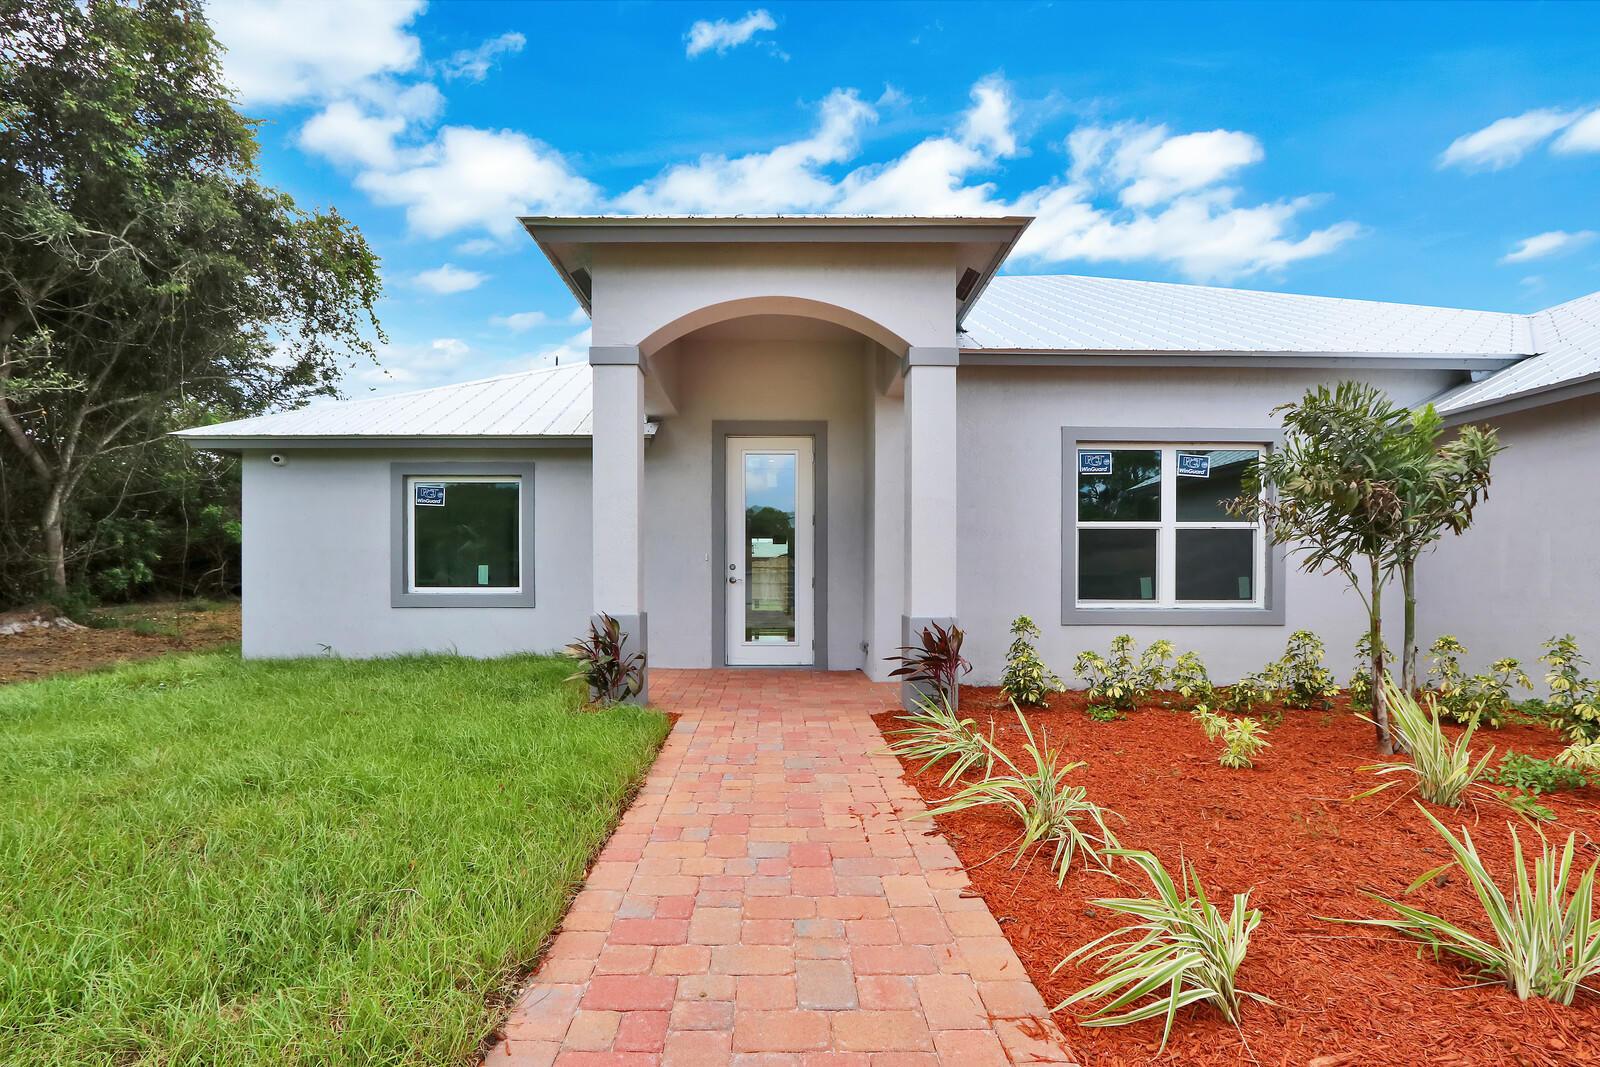 1064 SE Floresta Drive, Port Saint Lucie, Florida 34983, 3 Bedrooms Bedrooms, ,2 BathroomsBathrooms,Single Family,For Sale,1064 SE Floresta Drive,1,RX-10666488